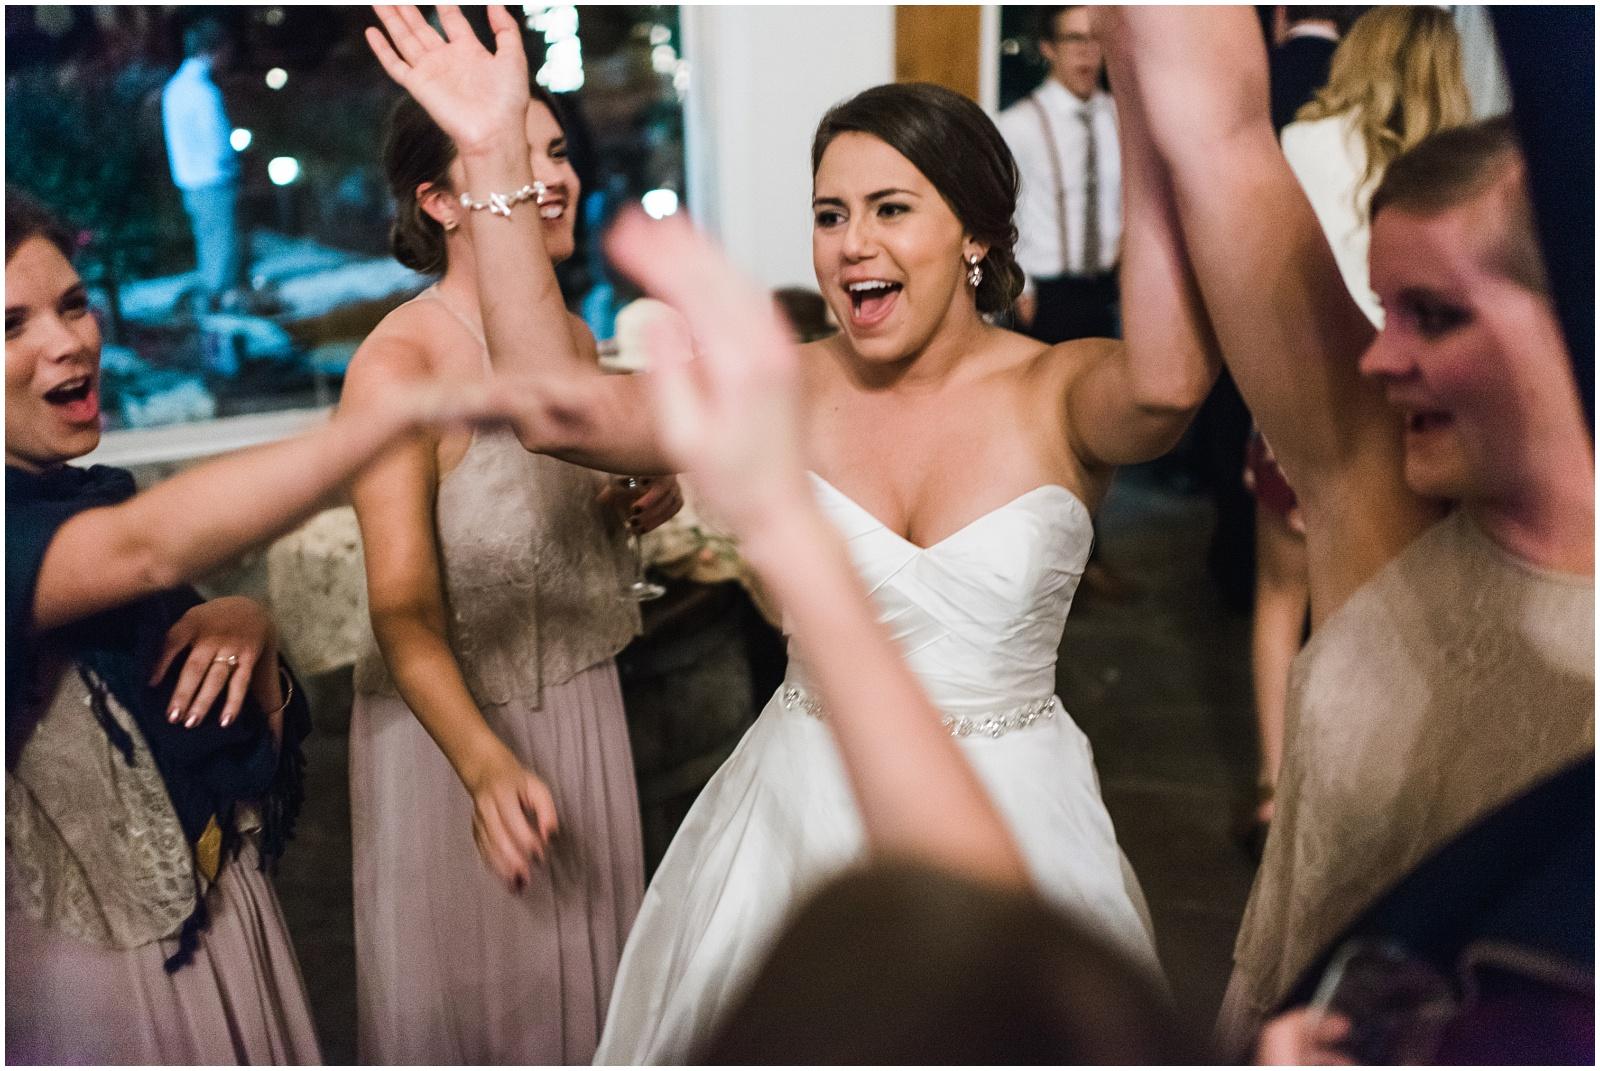 Bride and bridesmaids final goodbye